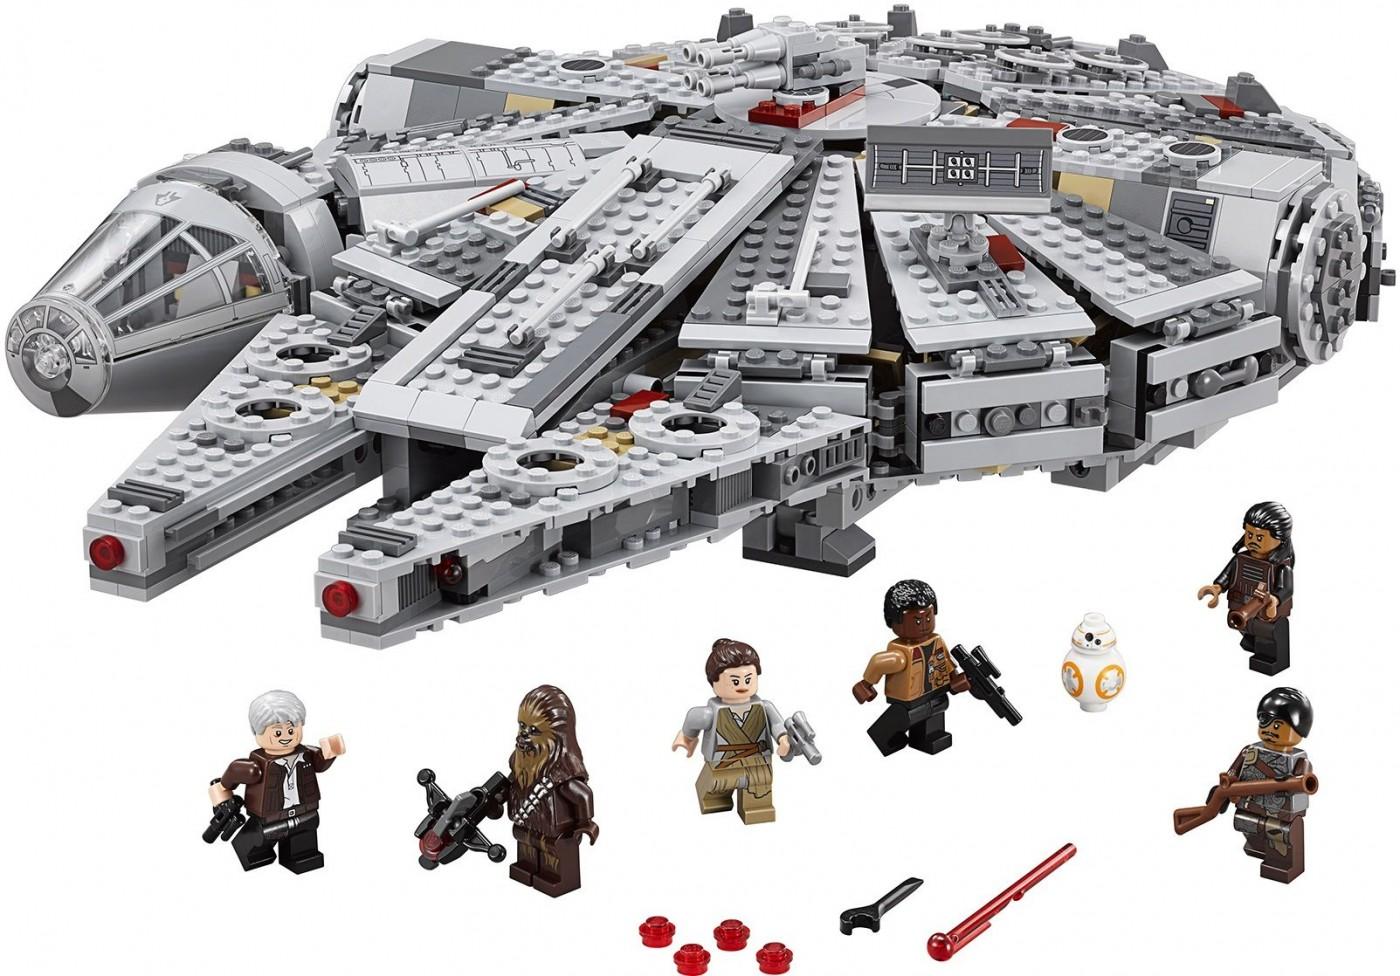 upcoming lego star wars the force awakens 2015 sets geek culture. Black Bedroom Furniture Sets. Home Design Ideas